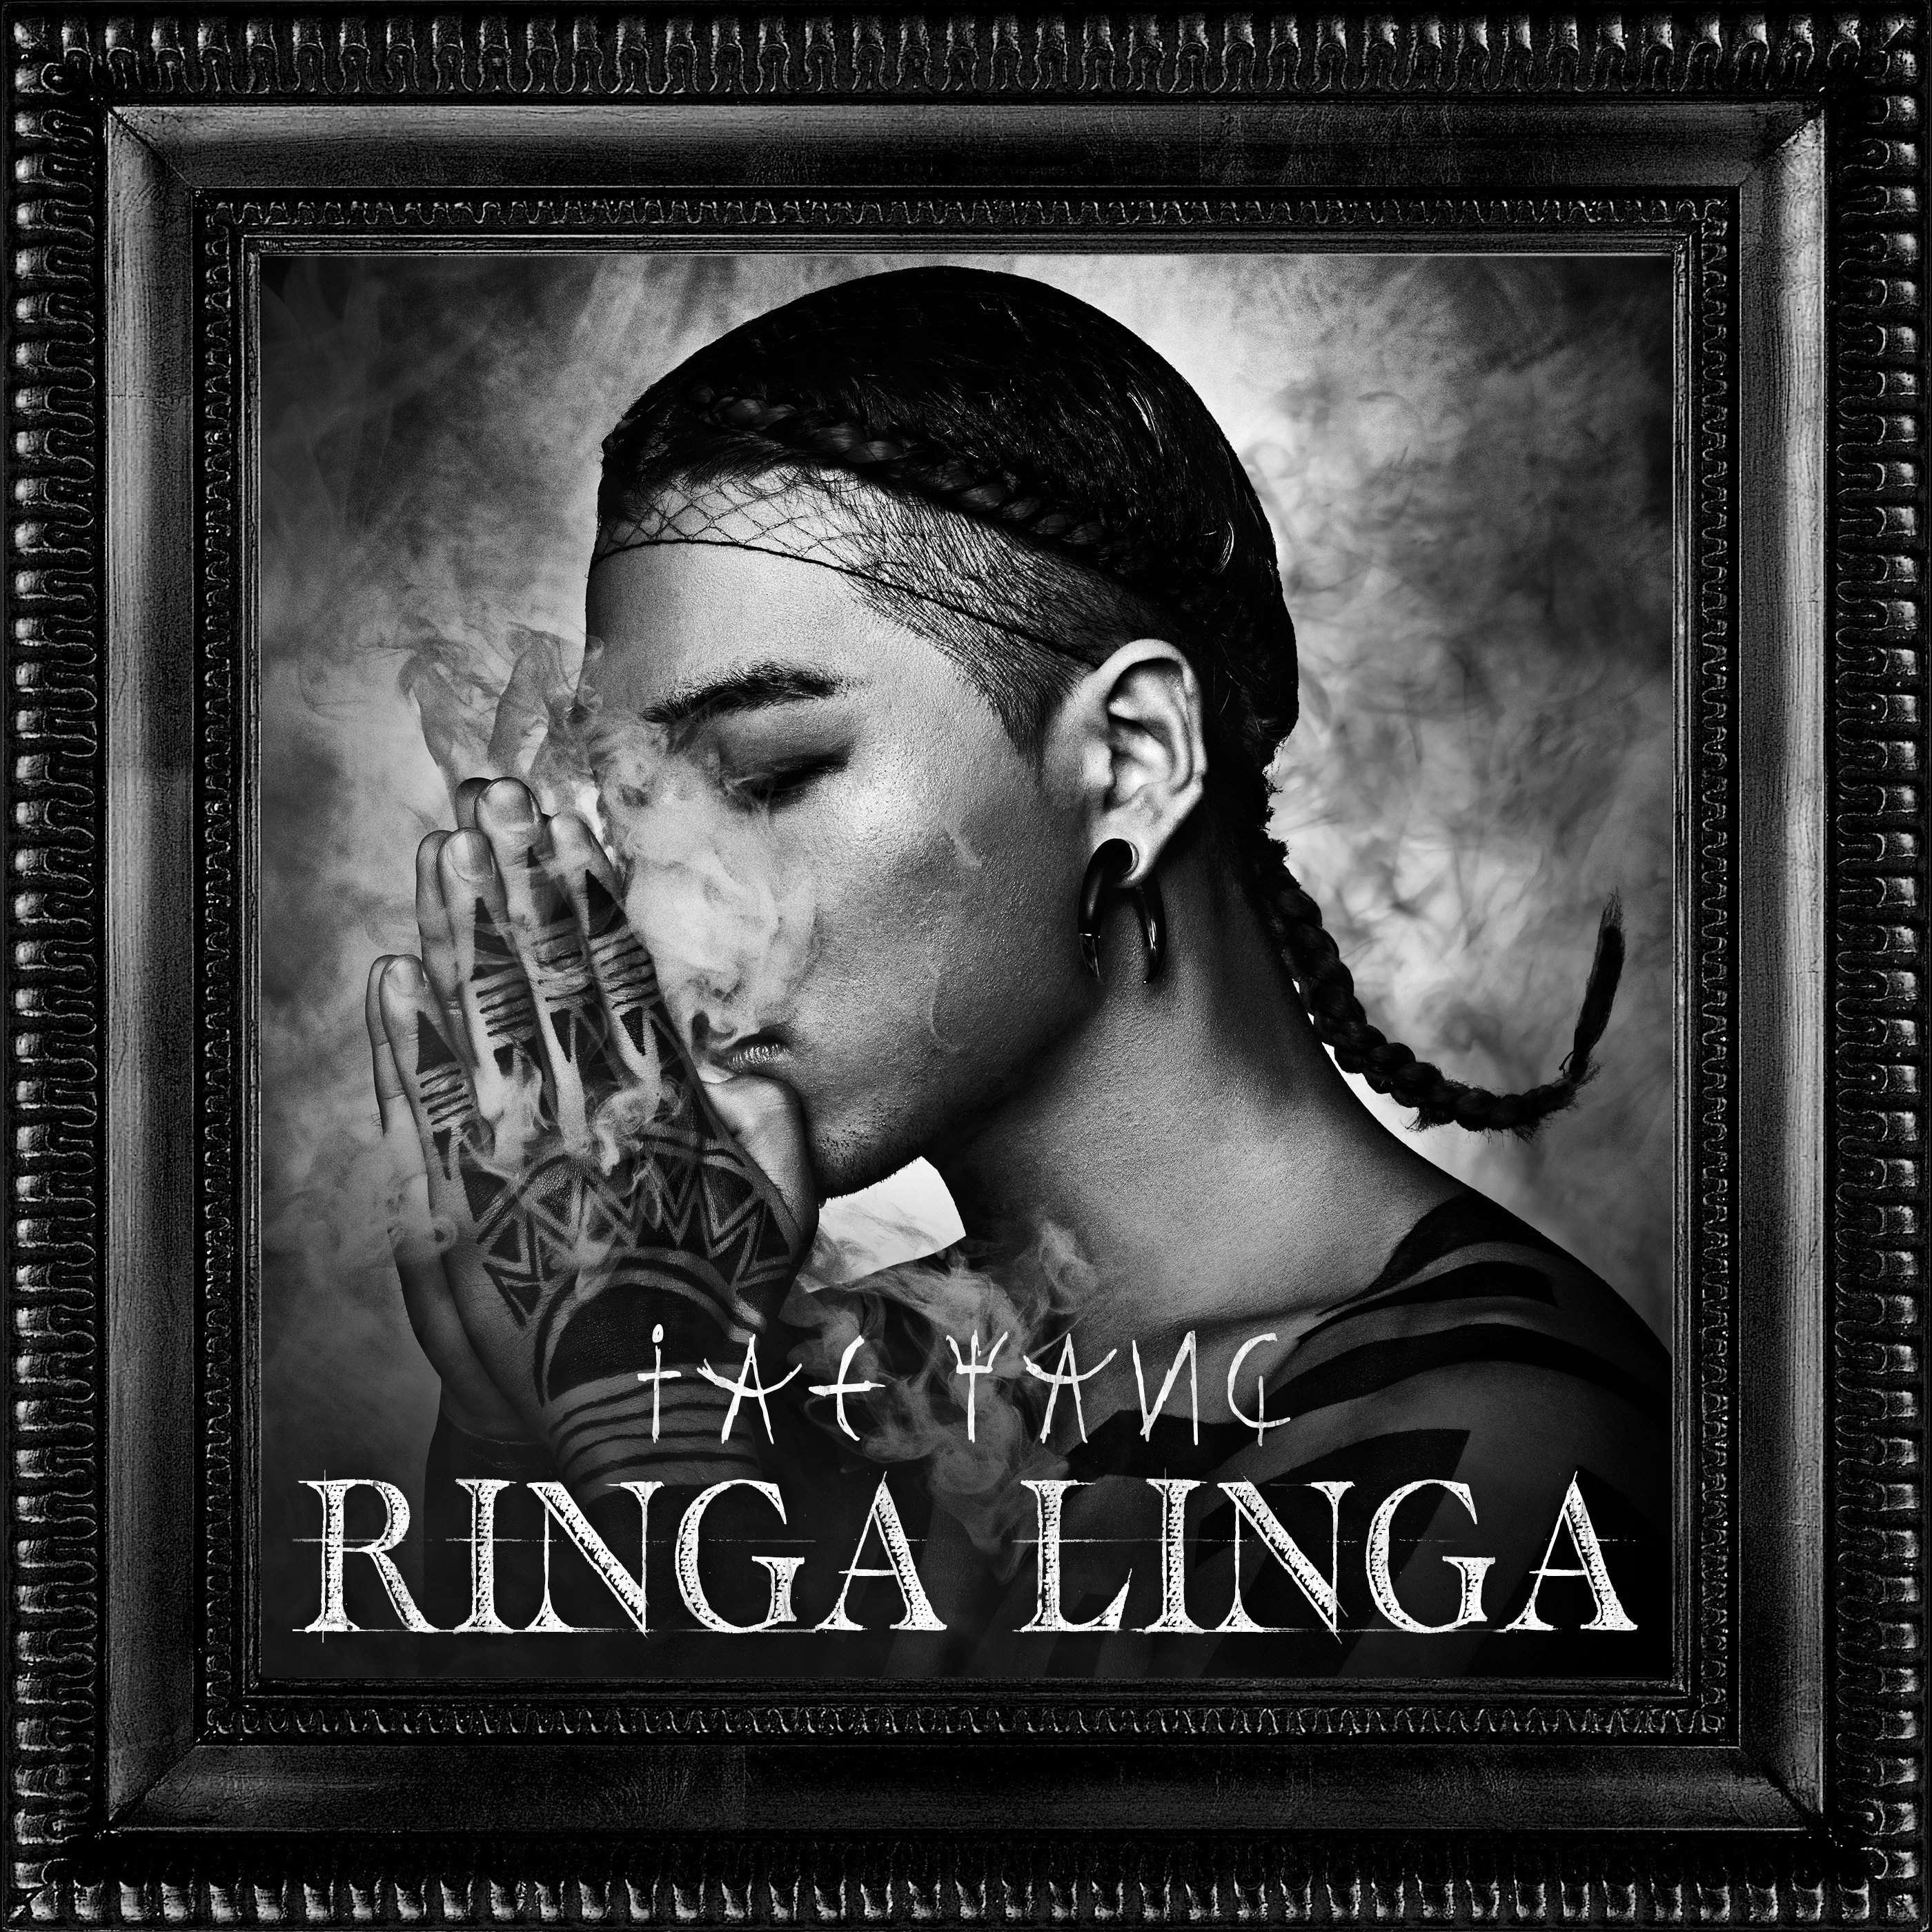 [Single] TAE YANG - RINGA LINGA